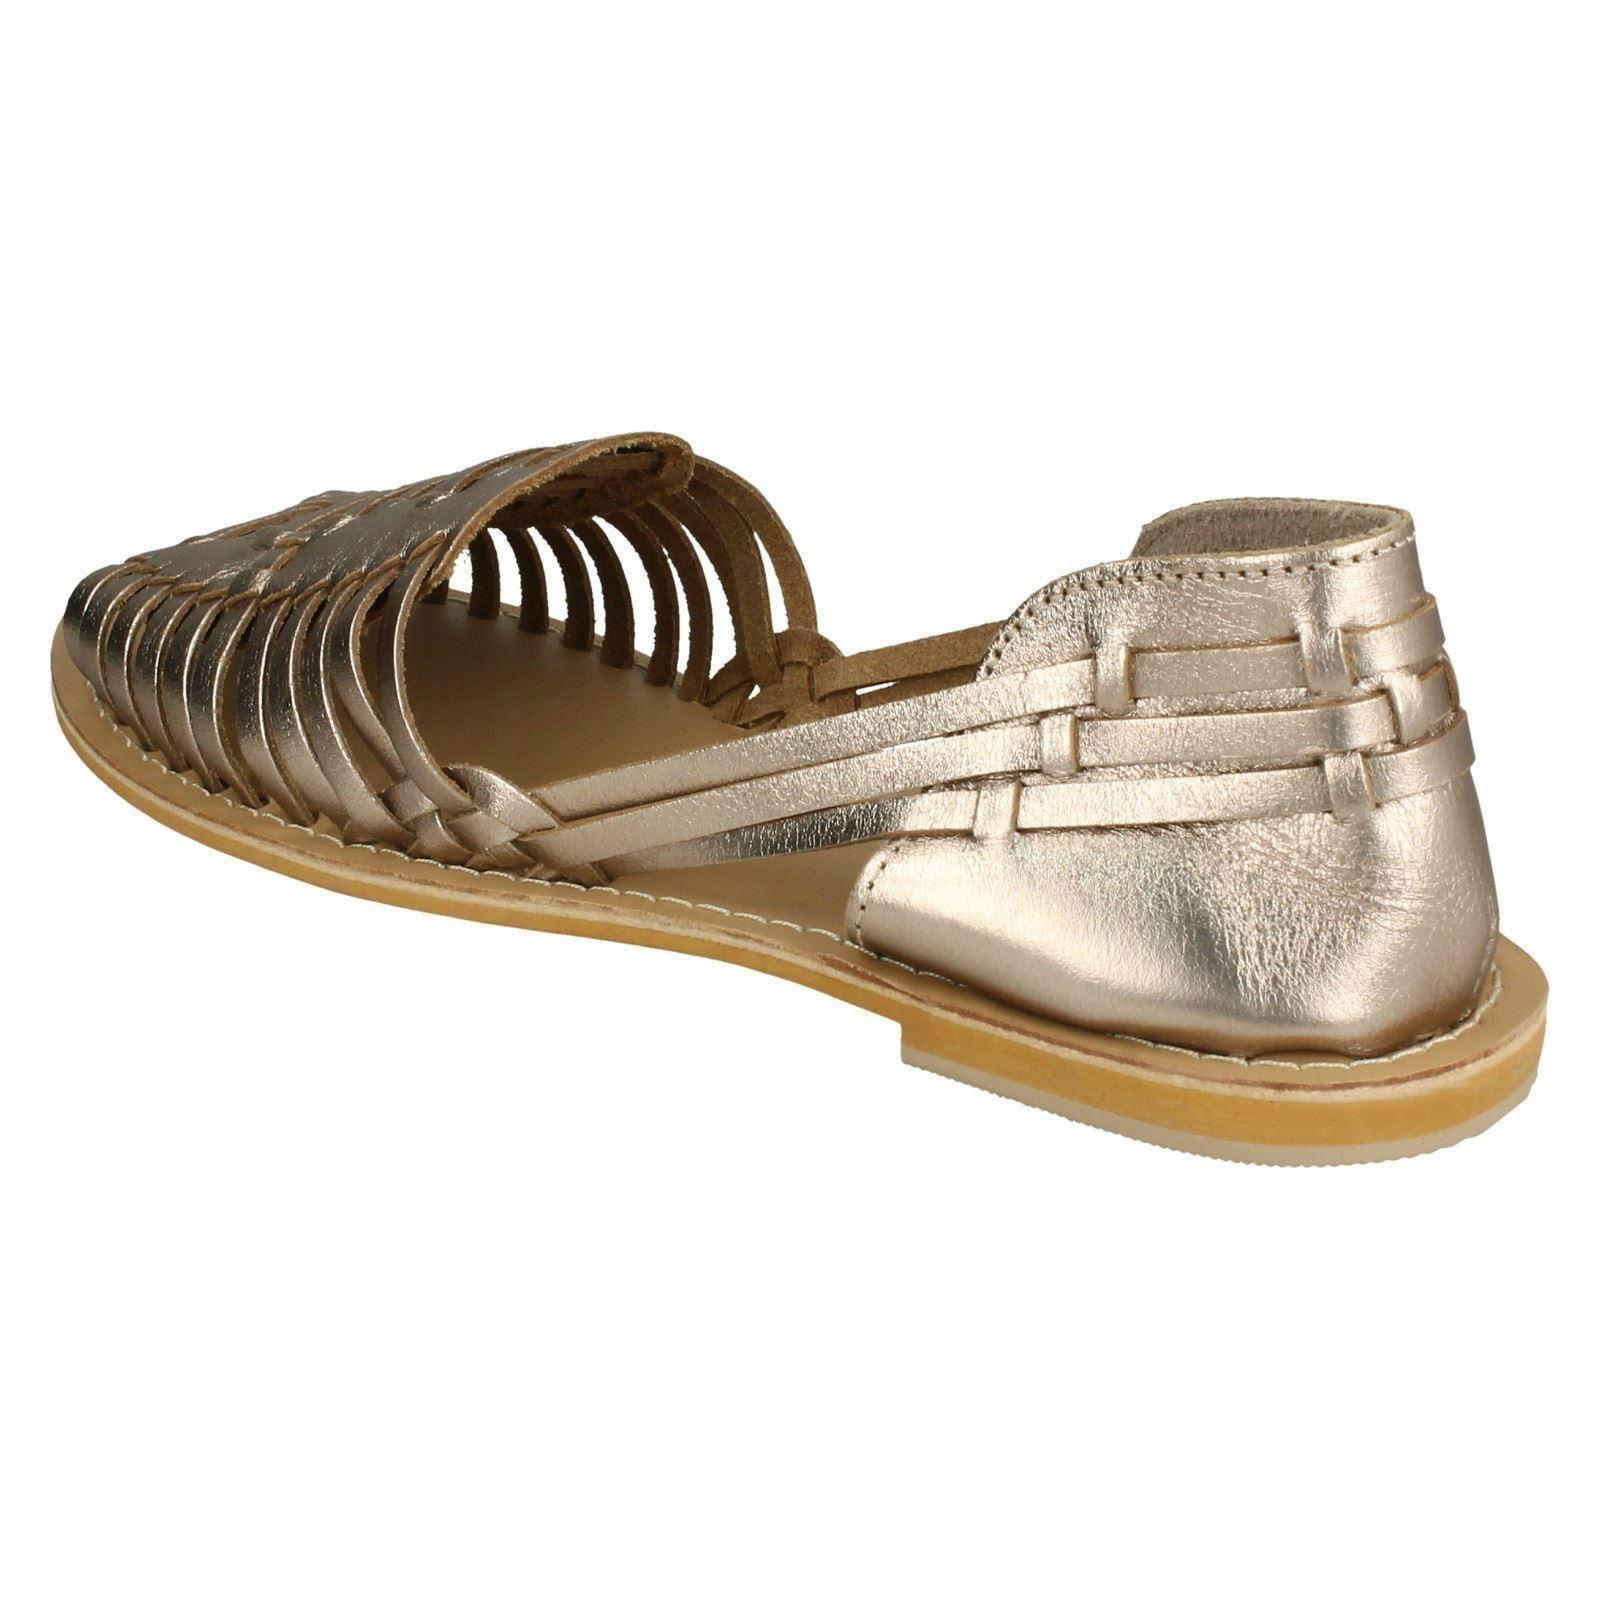 Mujer-Leather-Collection-Tejido-Plano-039-Sandalias-039